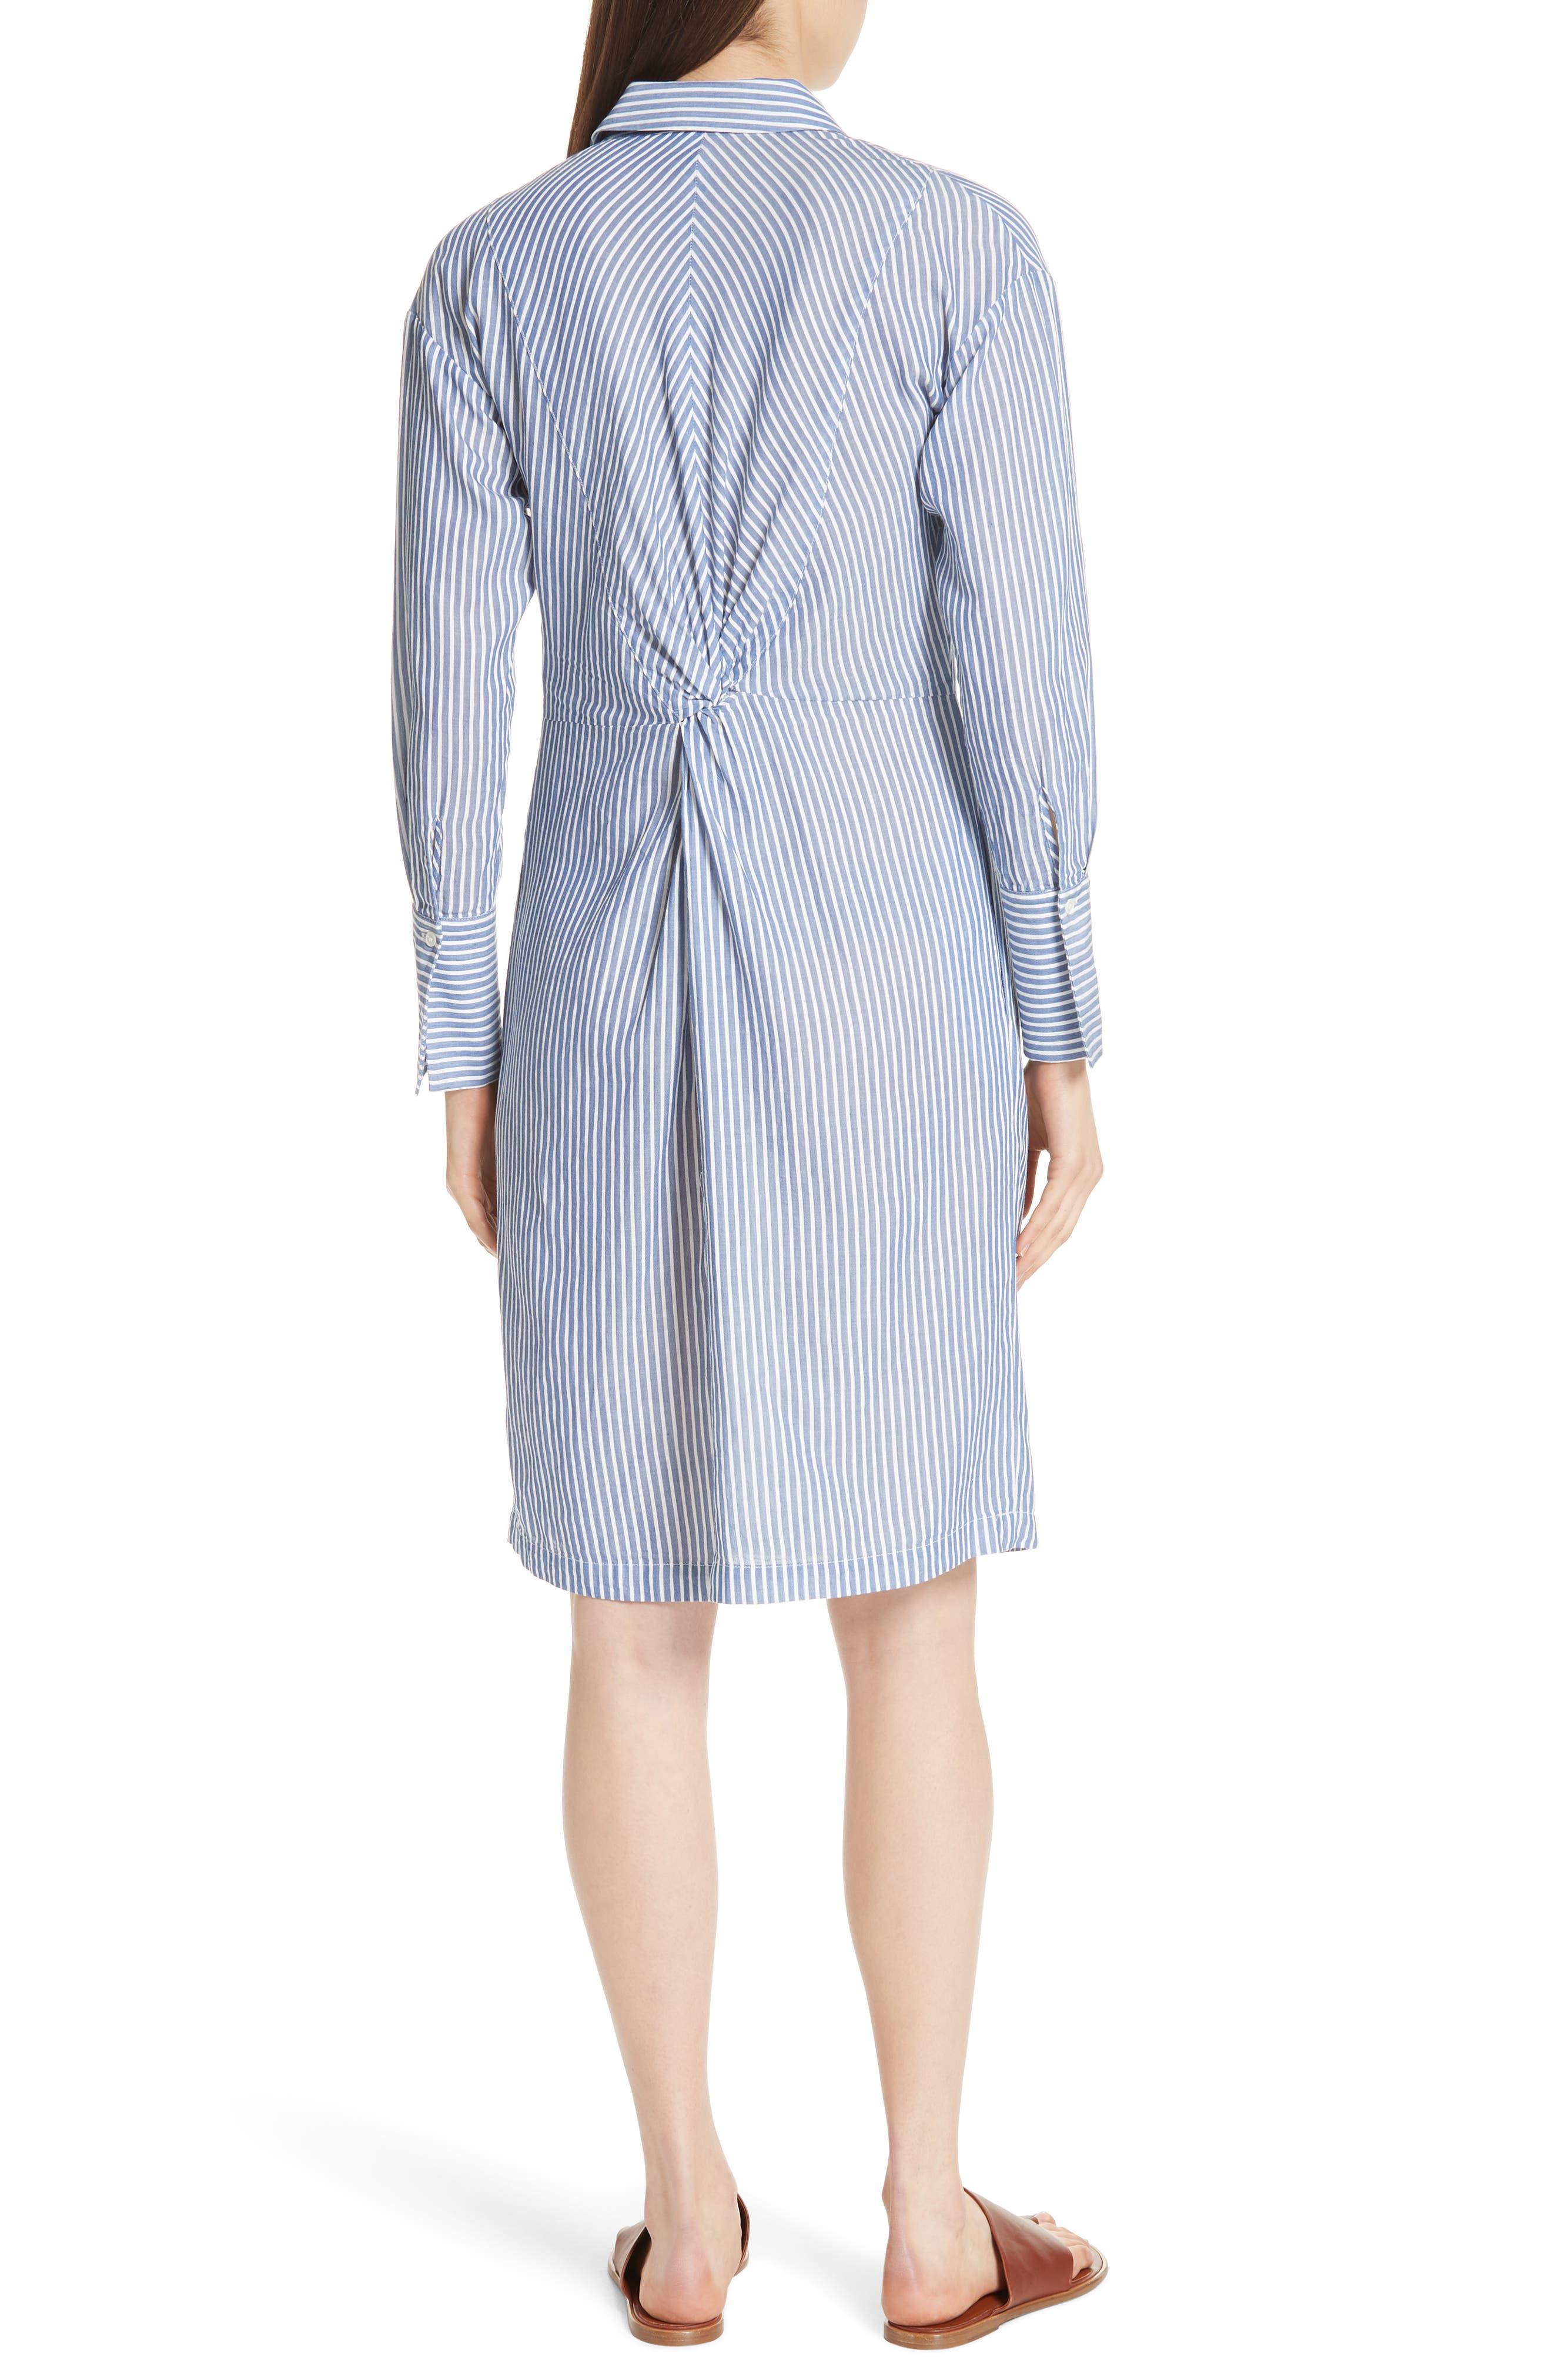 Classic Stripe Twist Cotton Blend Shirtdress,                             Alternate thumbnail 2, color,                             White/ Blue